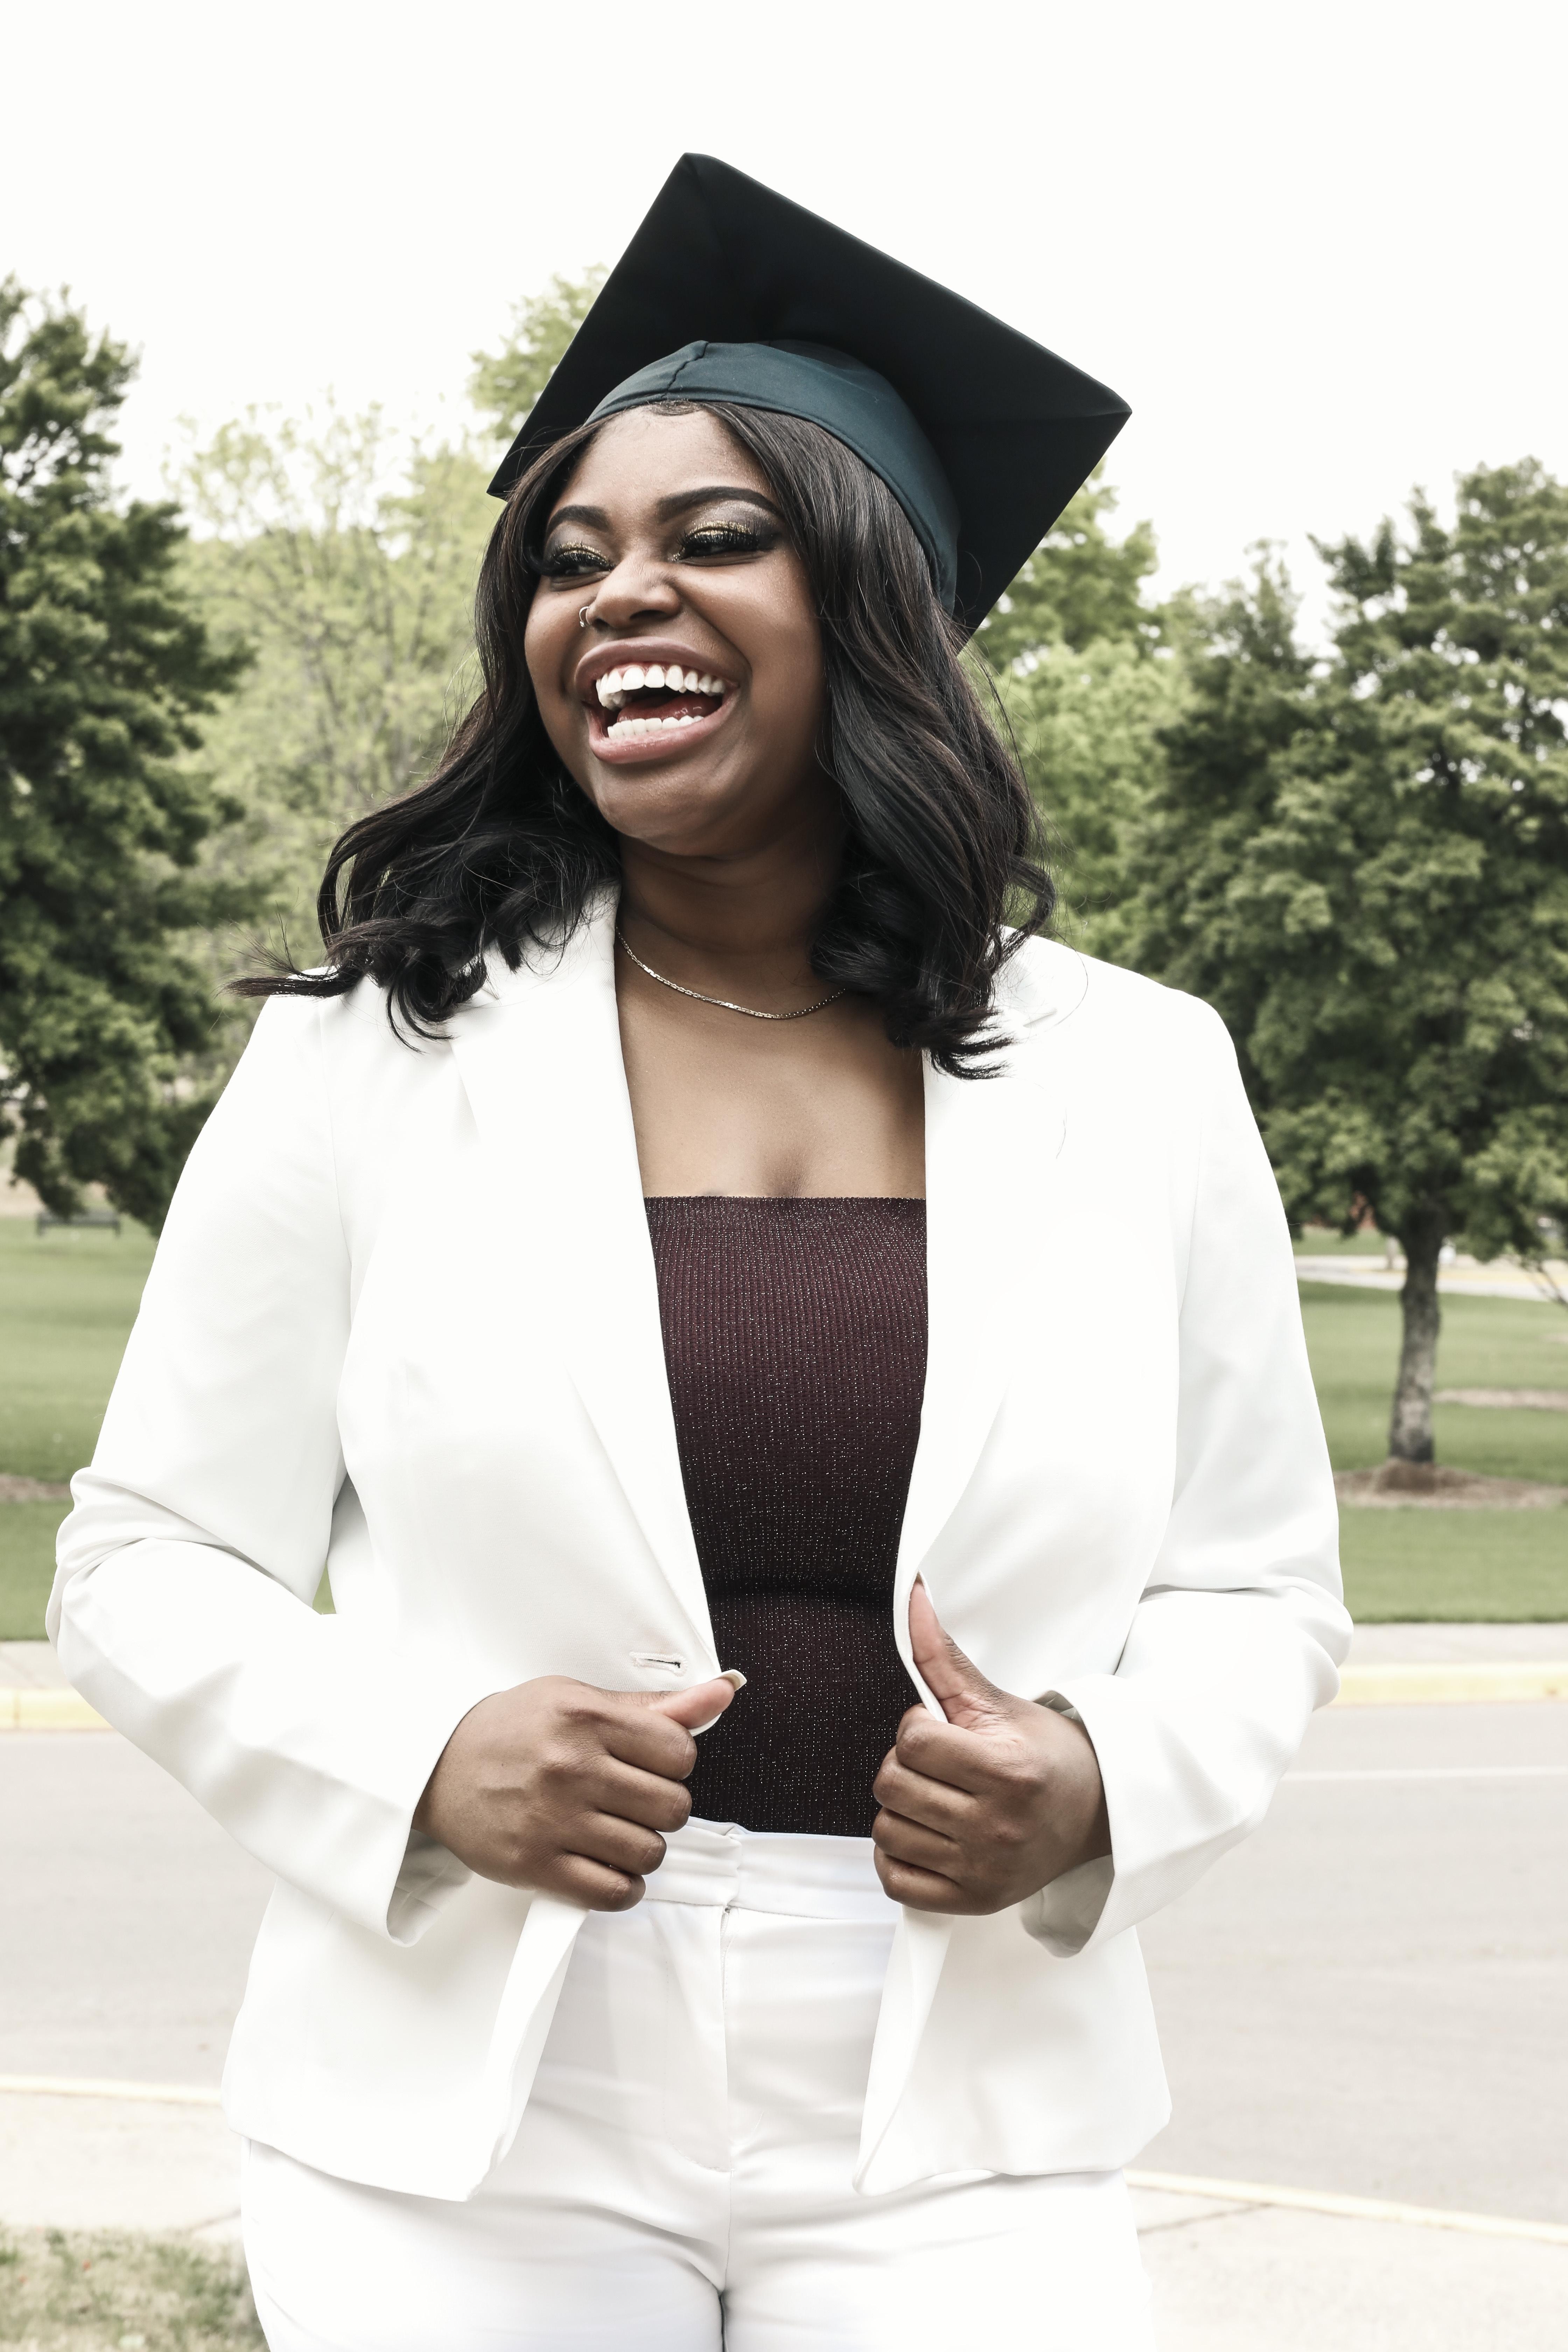 Graduation photo by Wesley Pellot